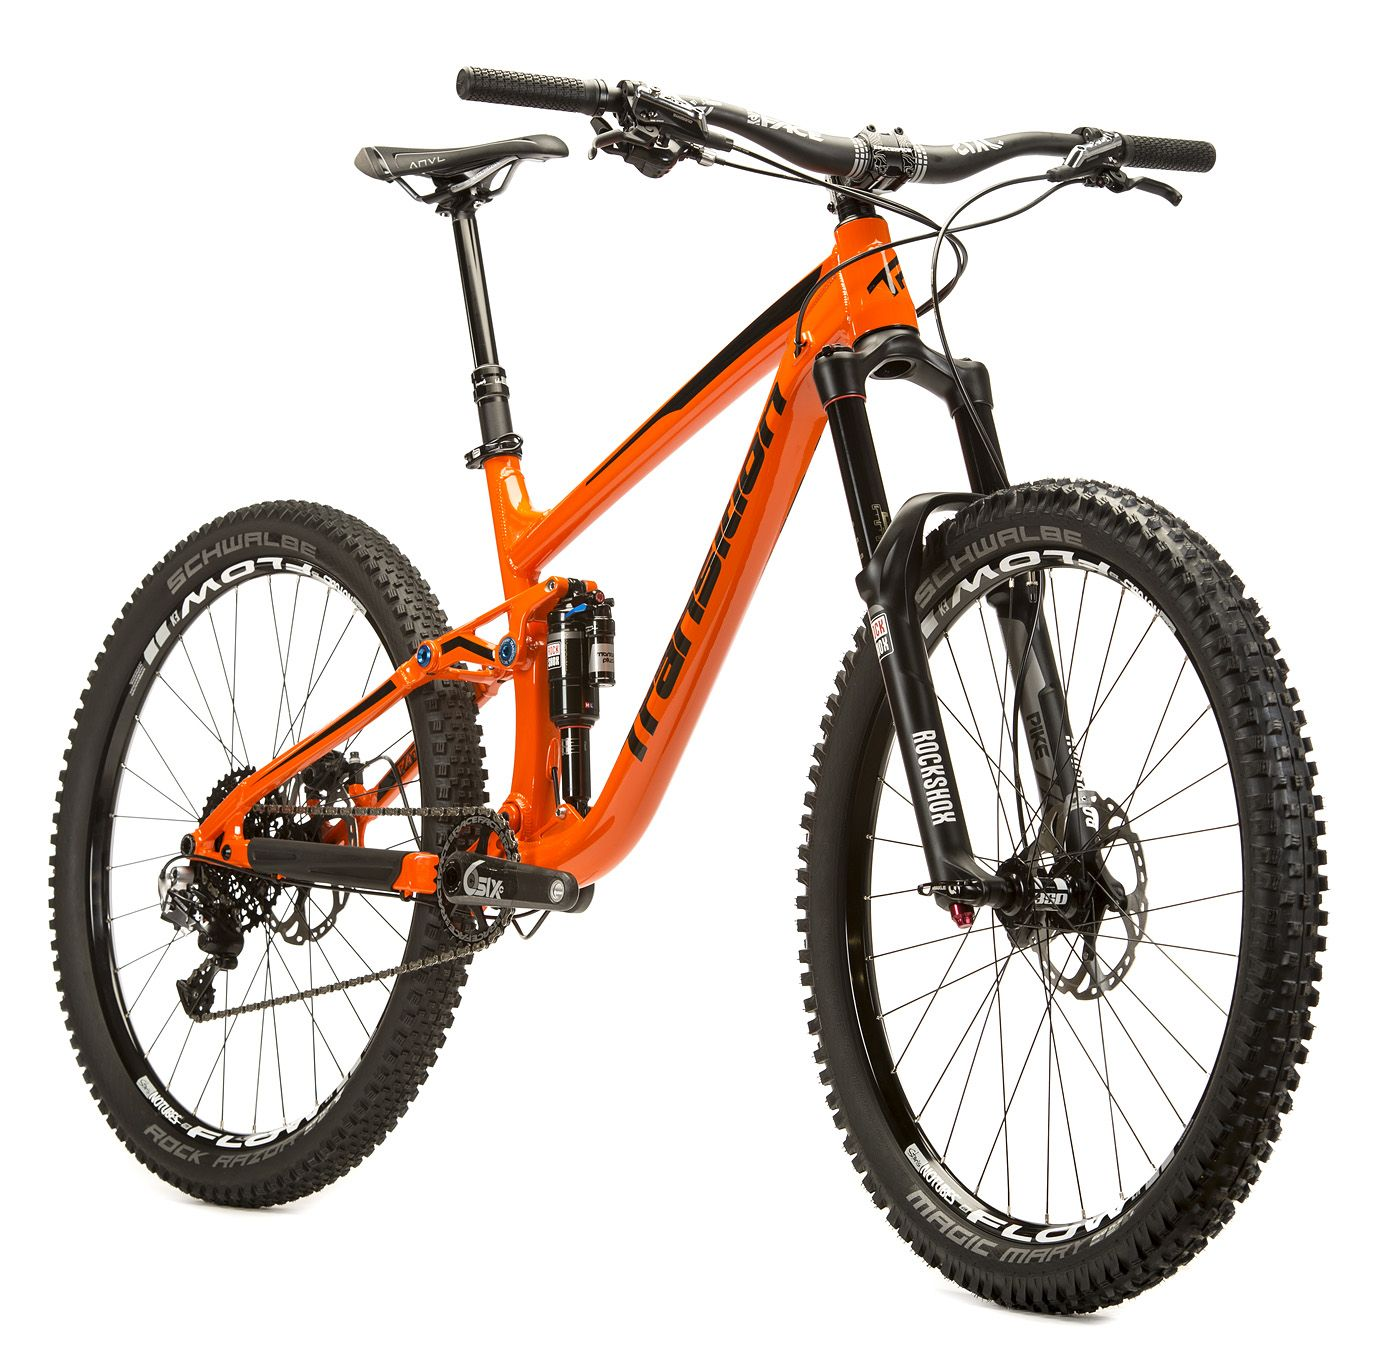 2015 Transition Bikes